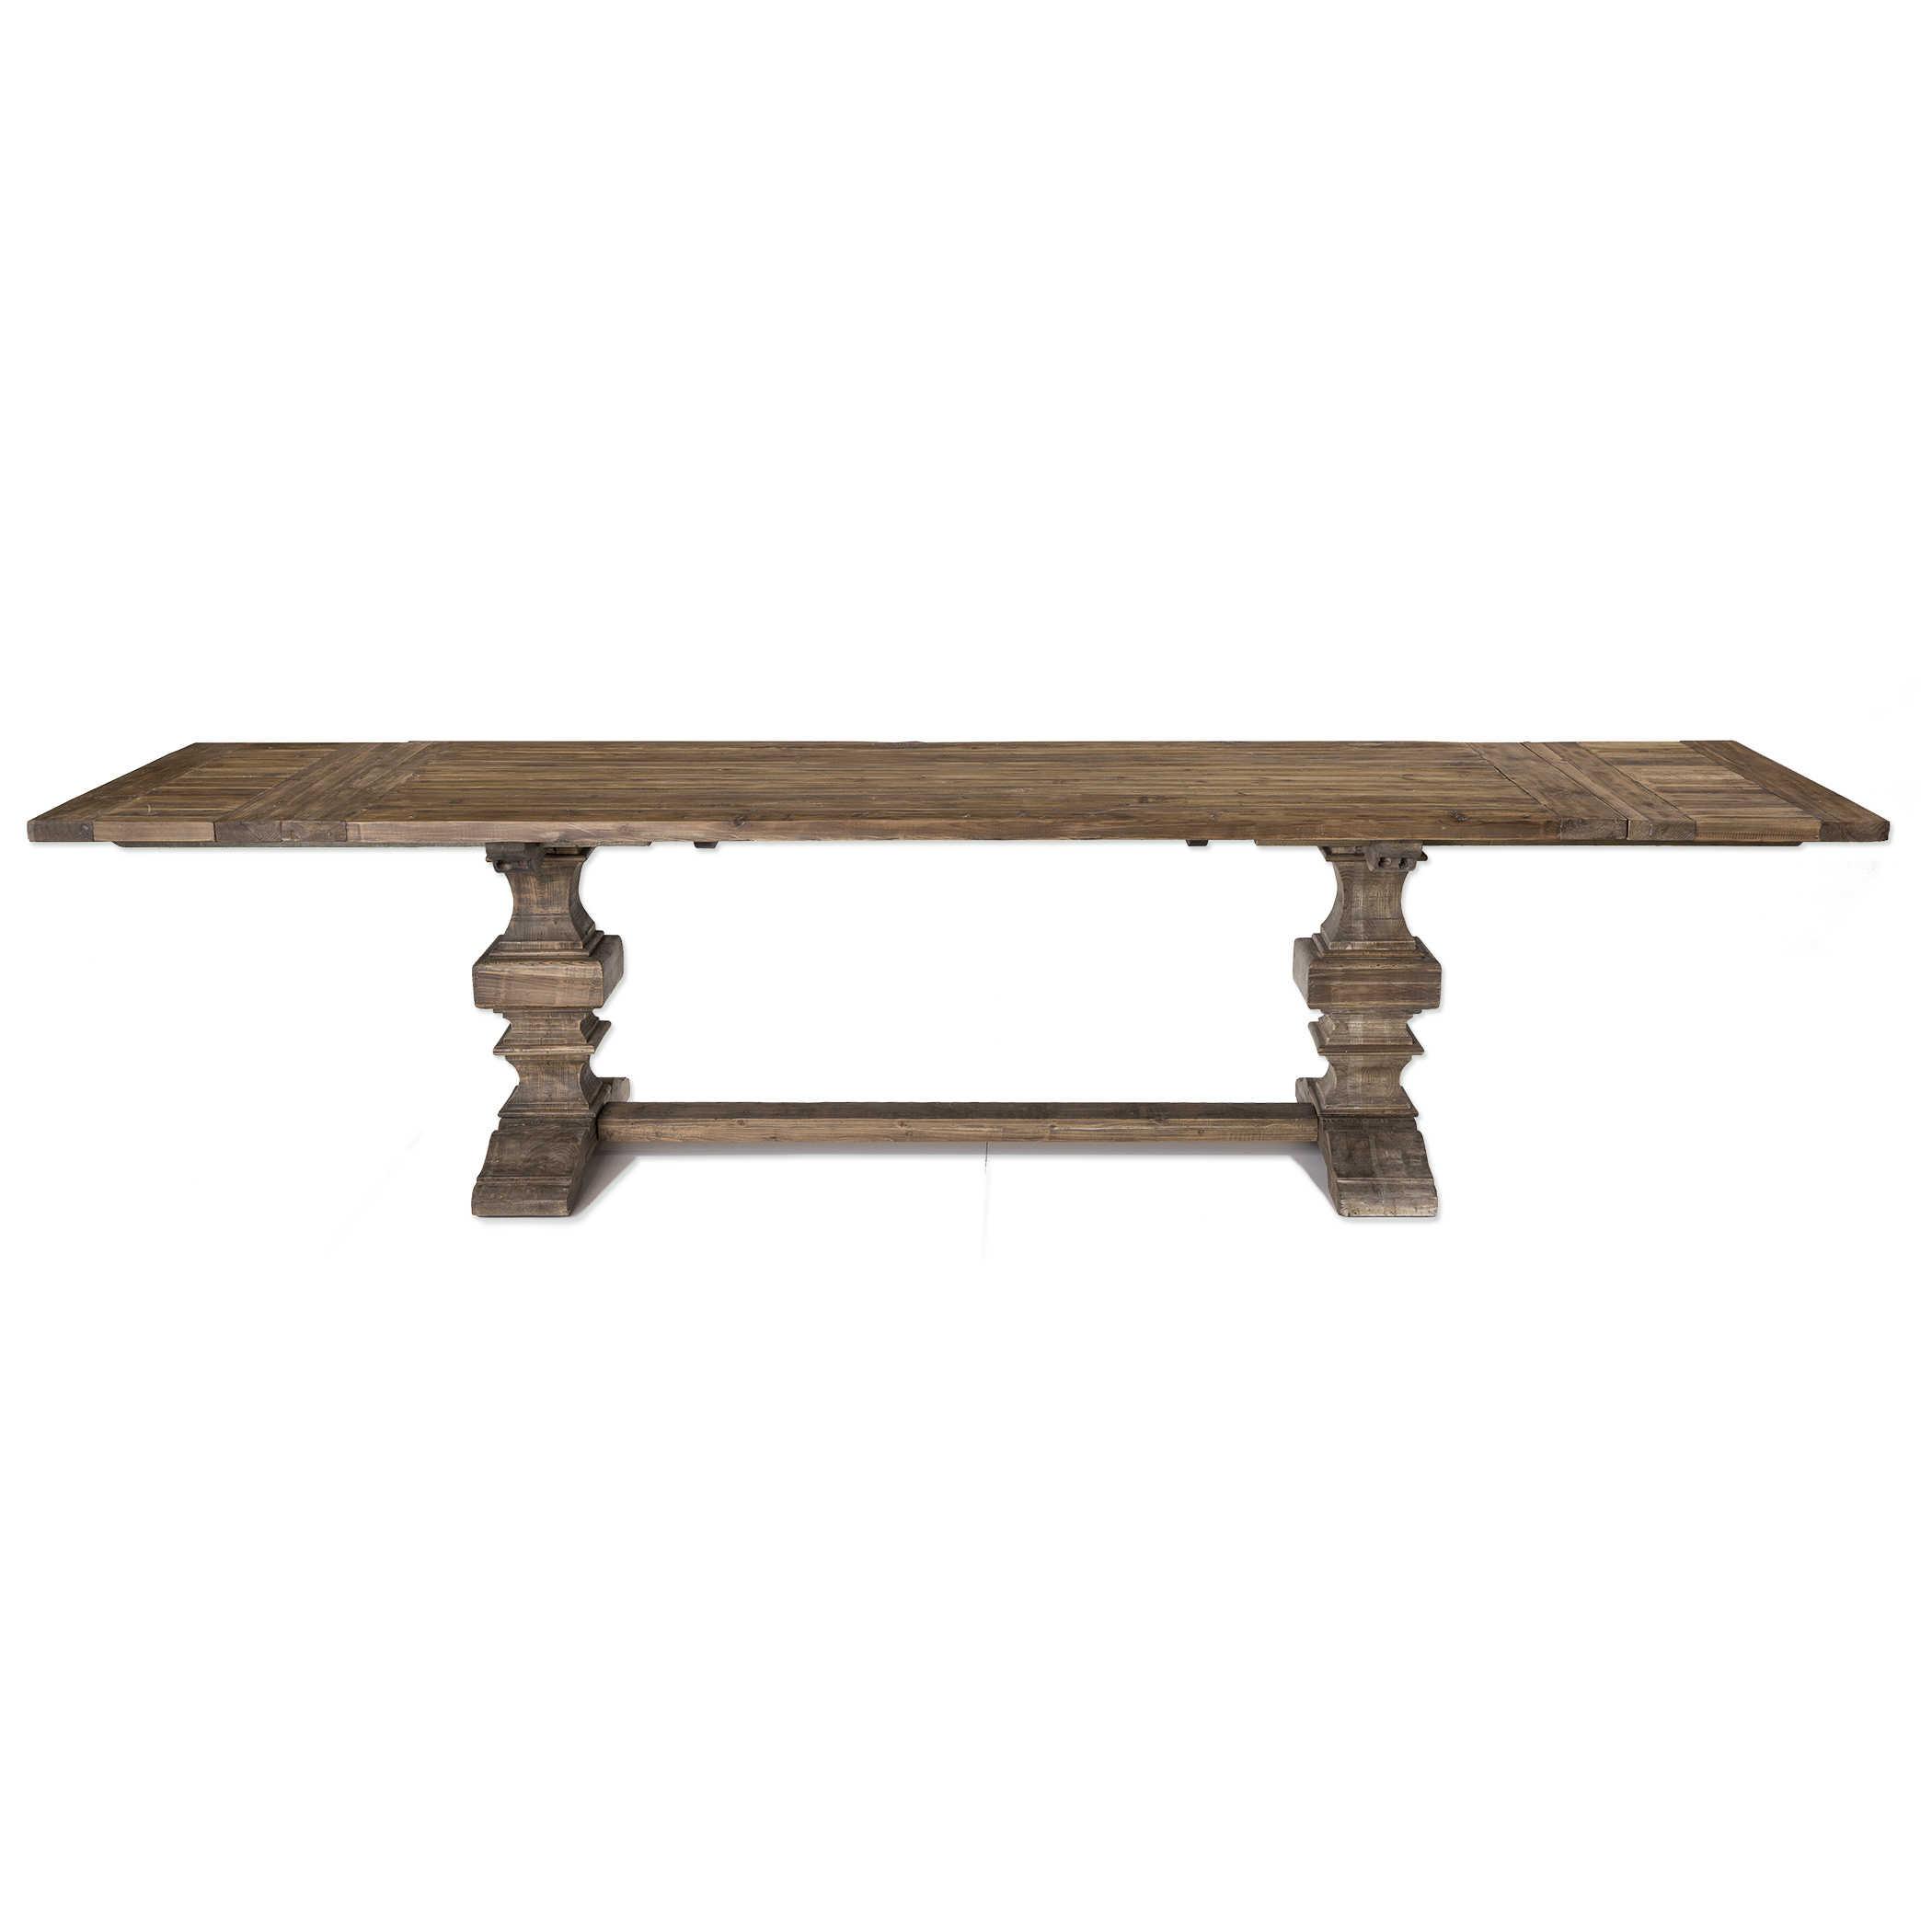 Baldrick Extension Dining Table Uttermost, Uttermost Dining Room Tables